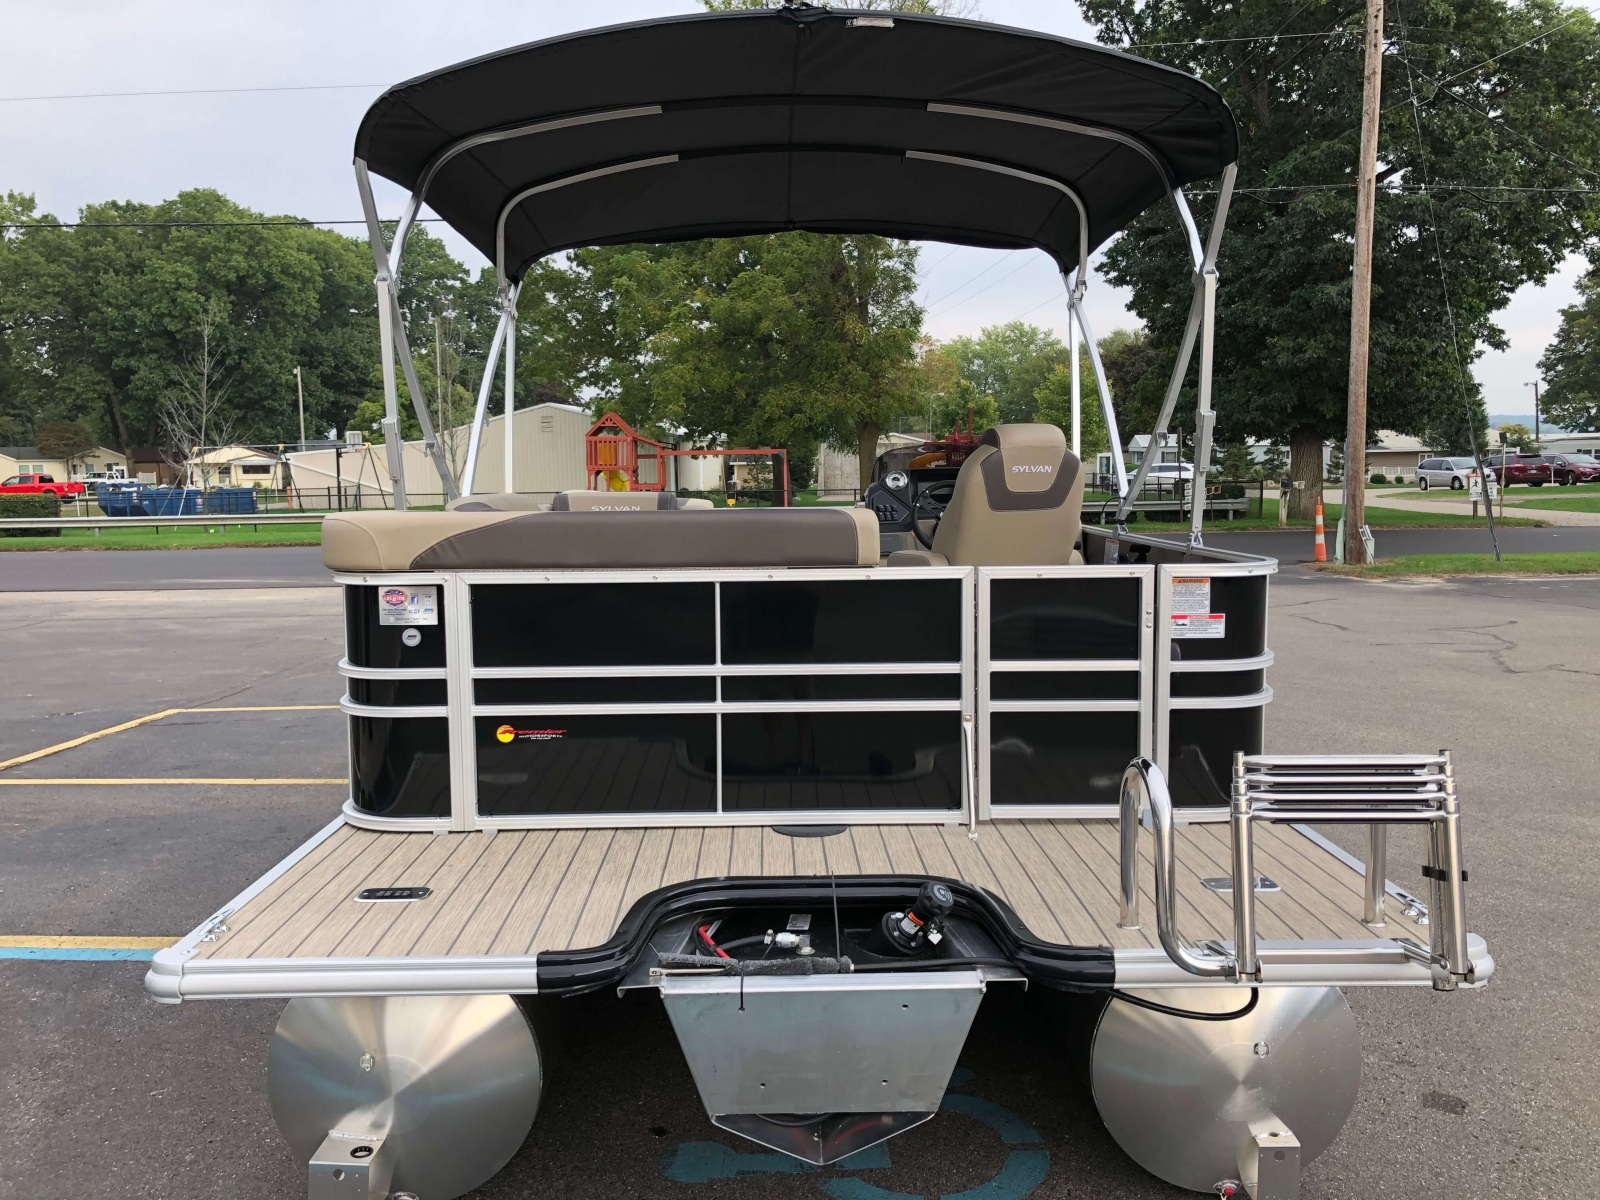 Extended Rear Swim Deck of a 2020 Sylvan L1 Cruise Pontoon